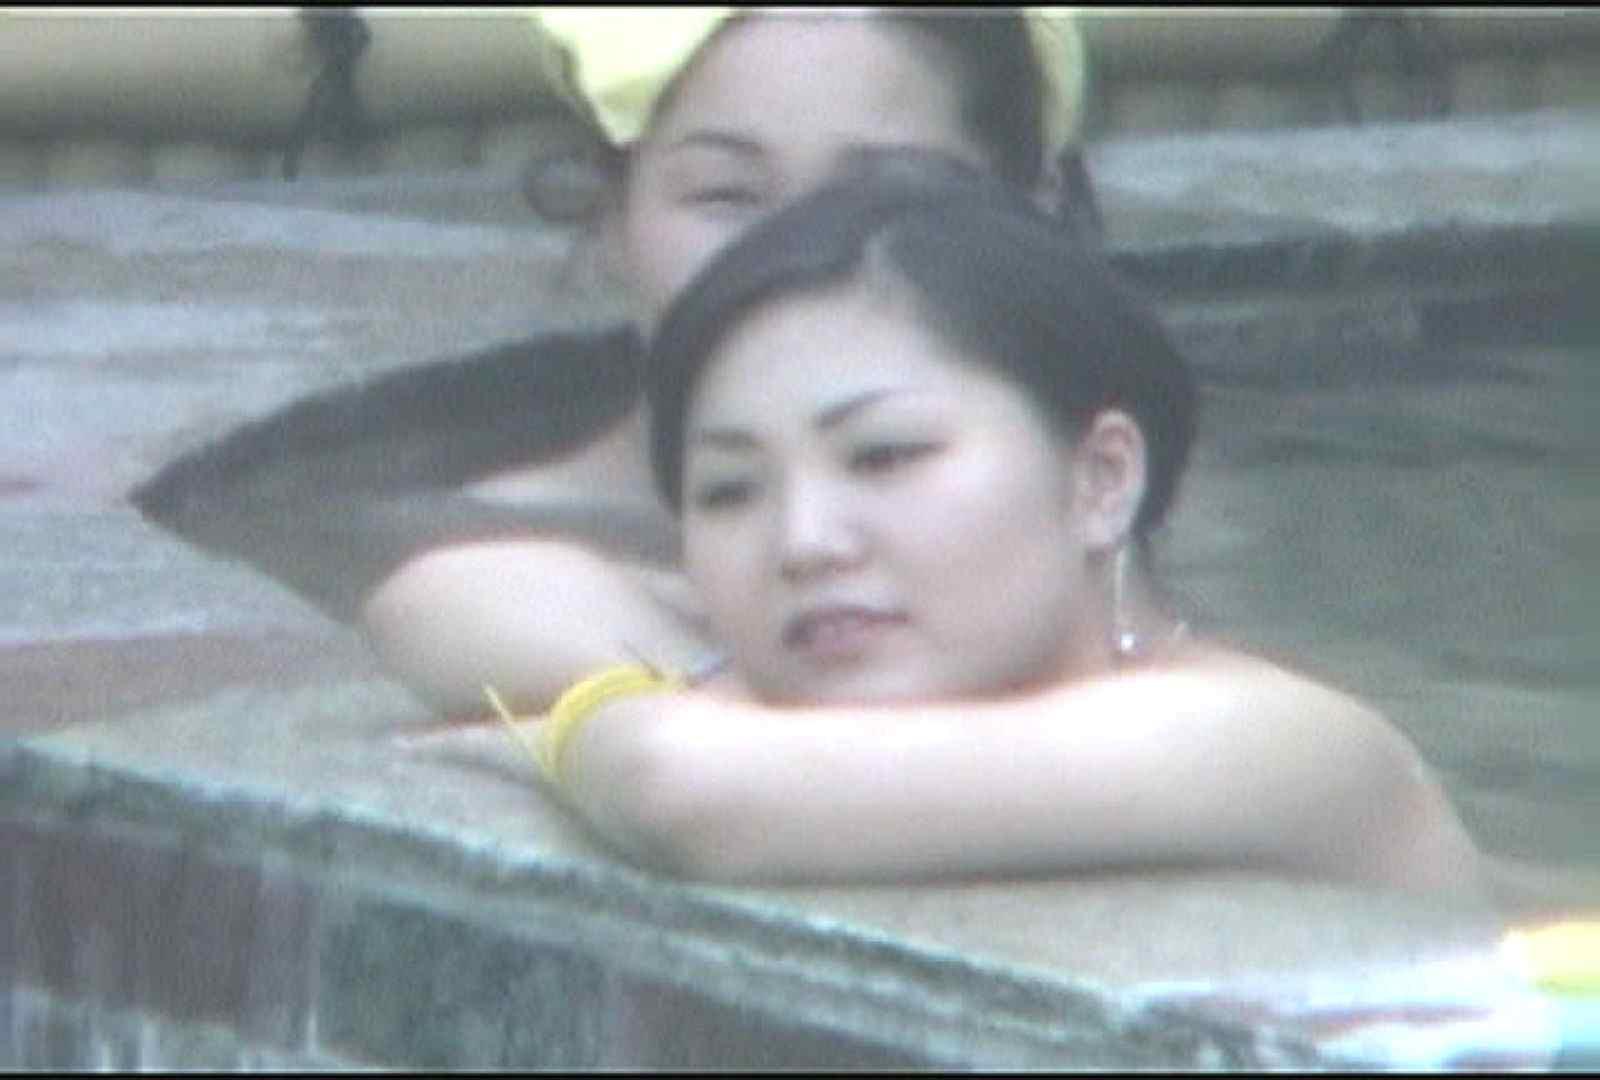 Aquaな露天風呂Vol.145 盗撮映像  78Pix 25